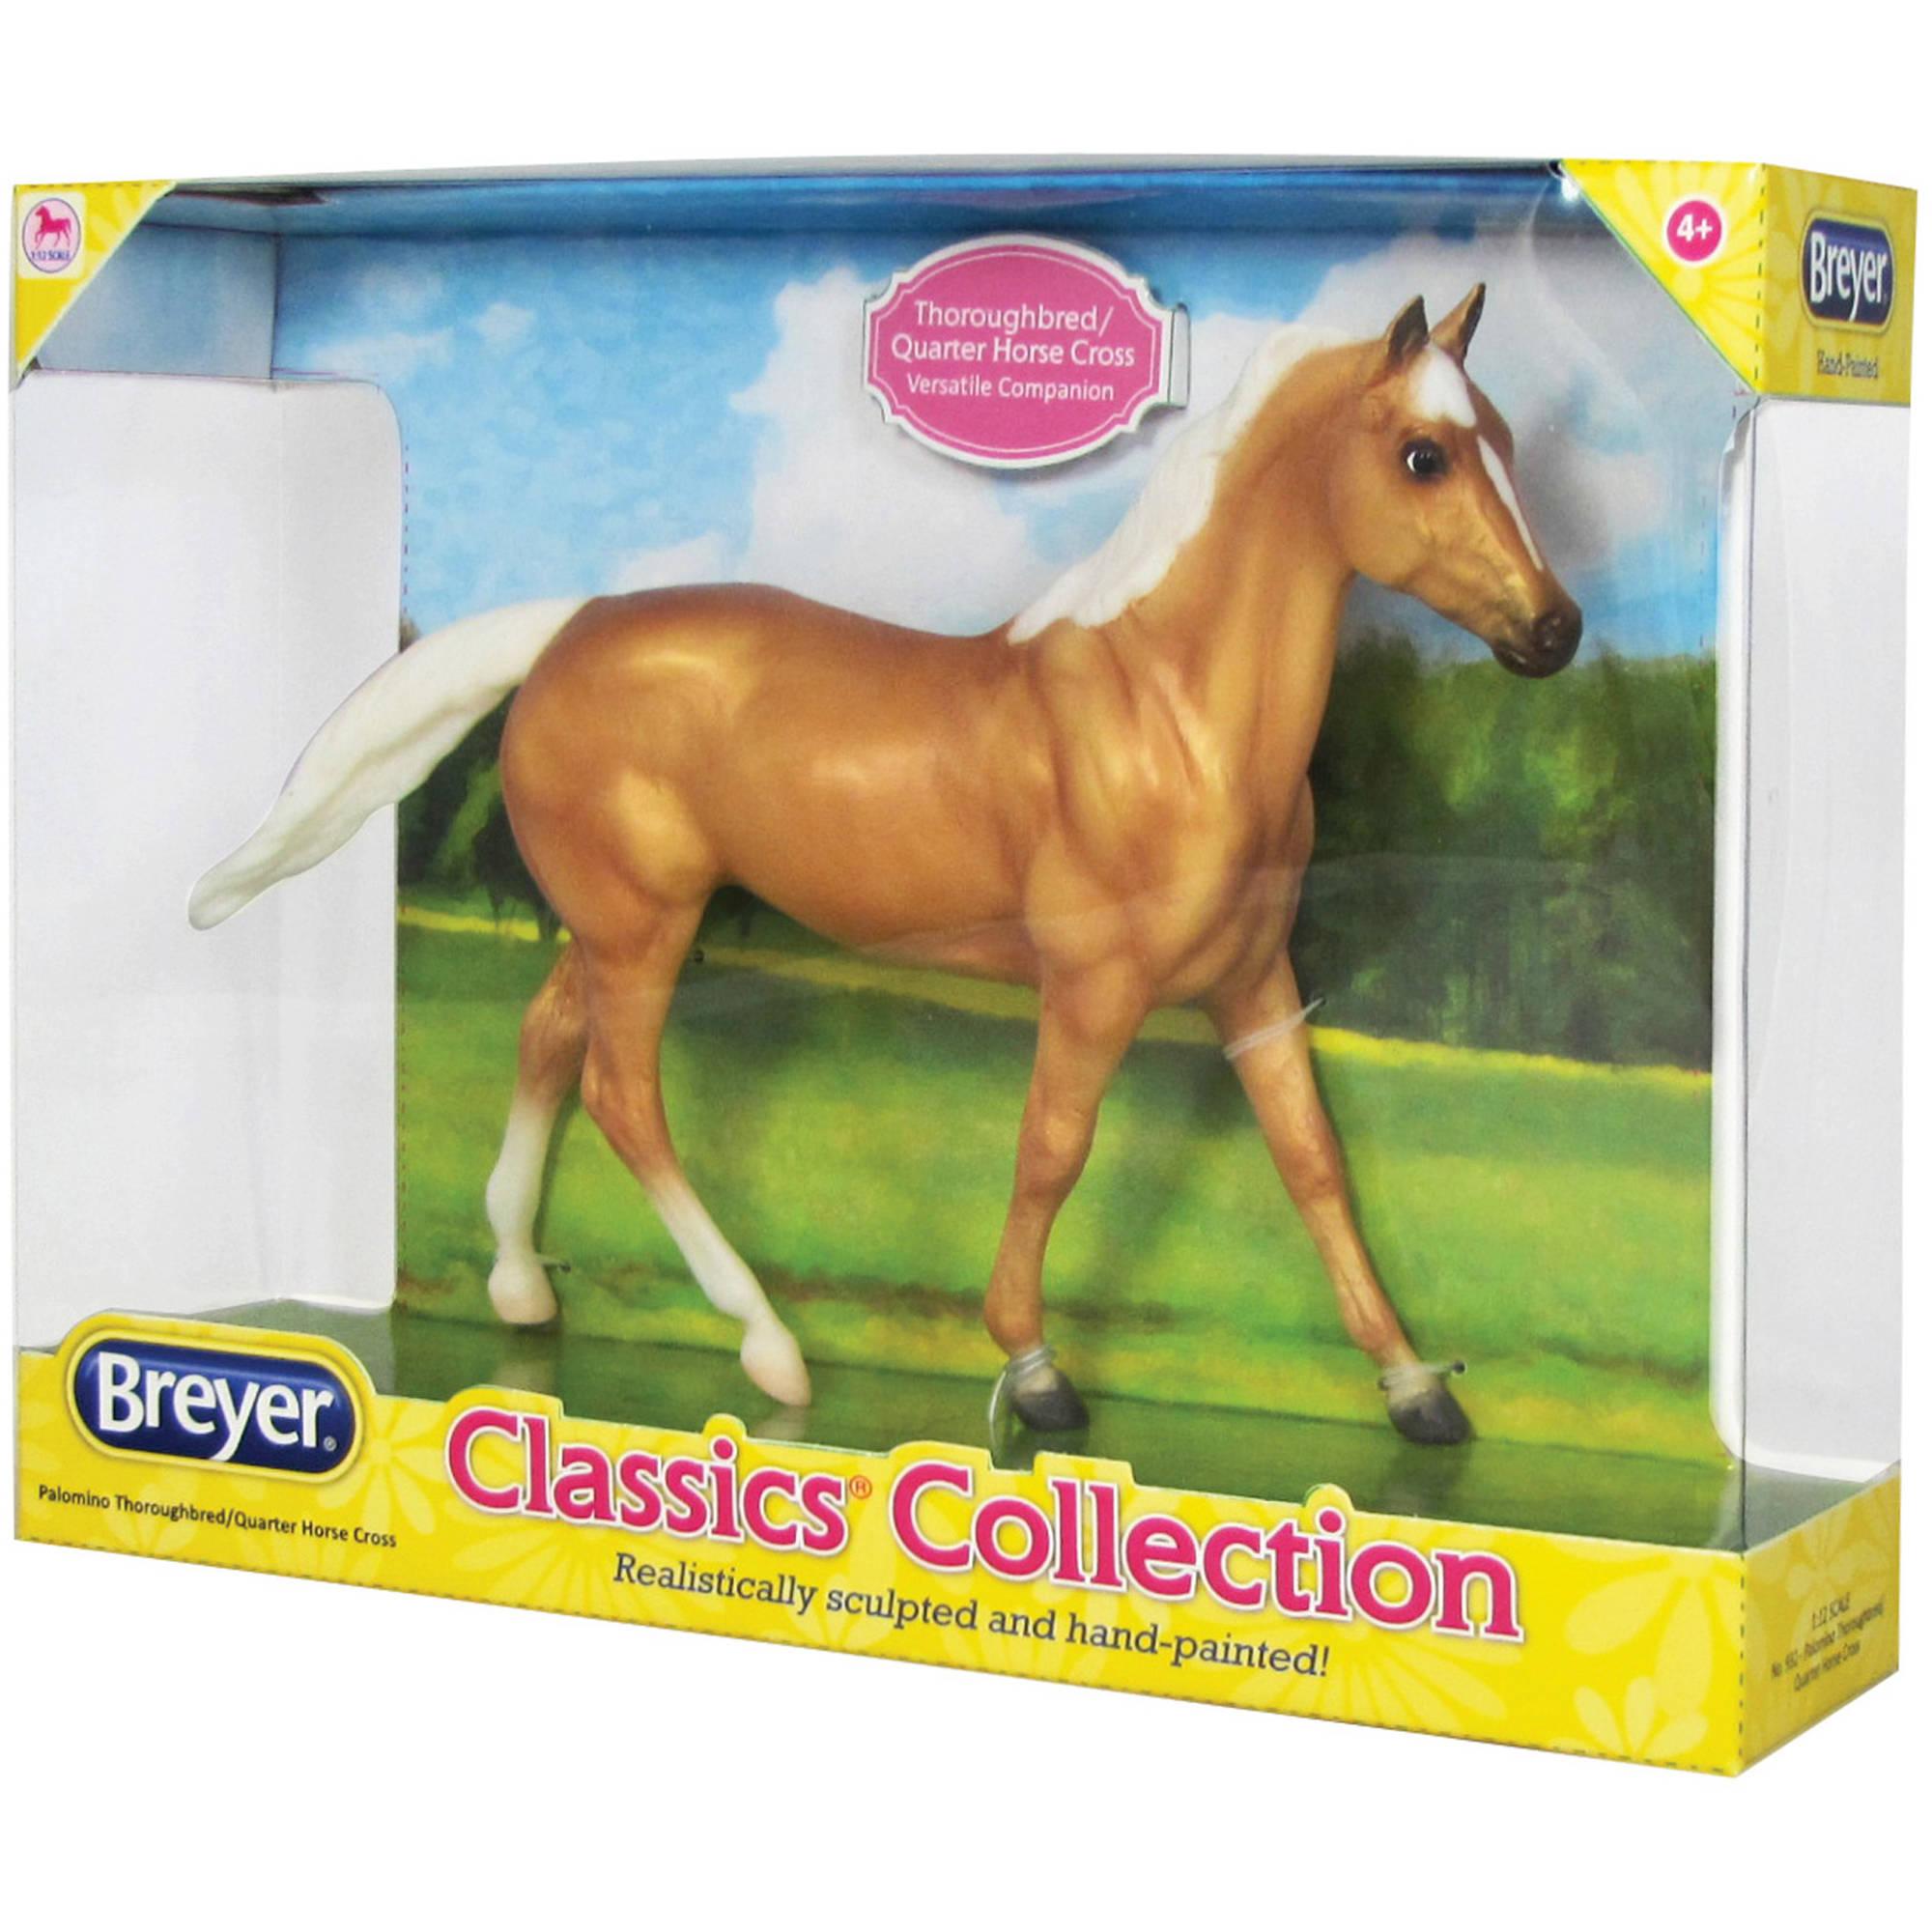 Breyer Classics Palomino Thoroughbred/Quarter Horse Cross